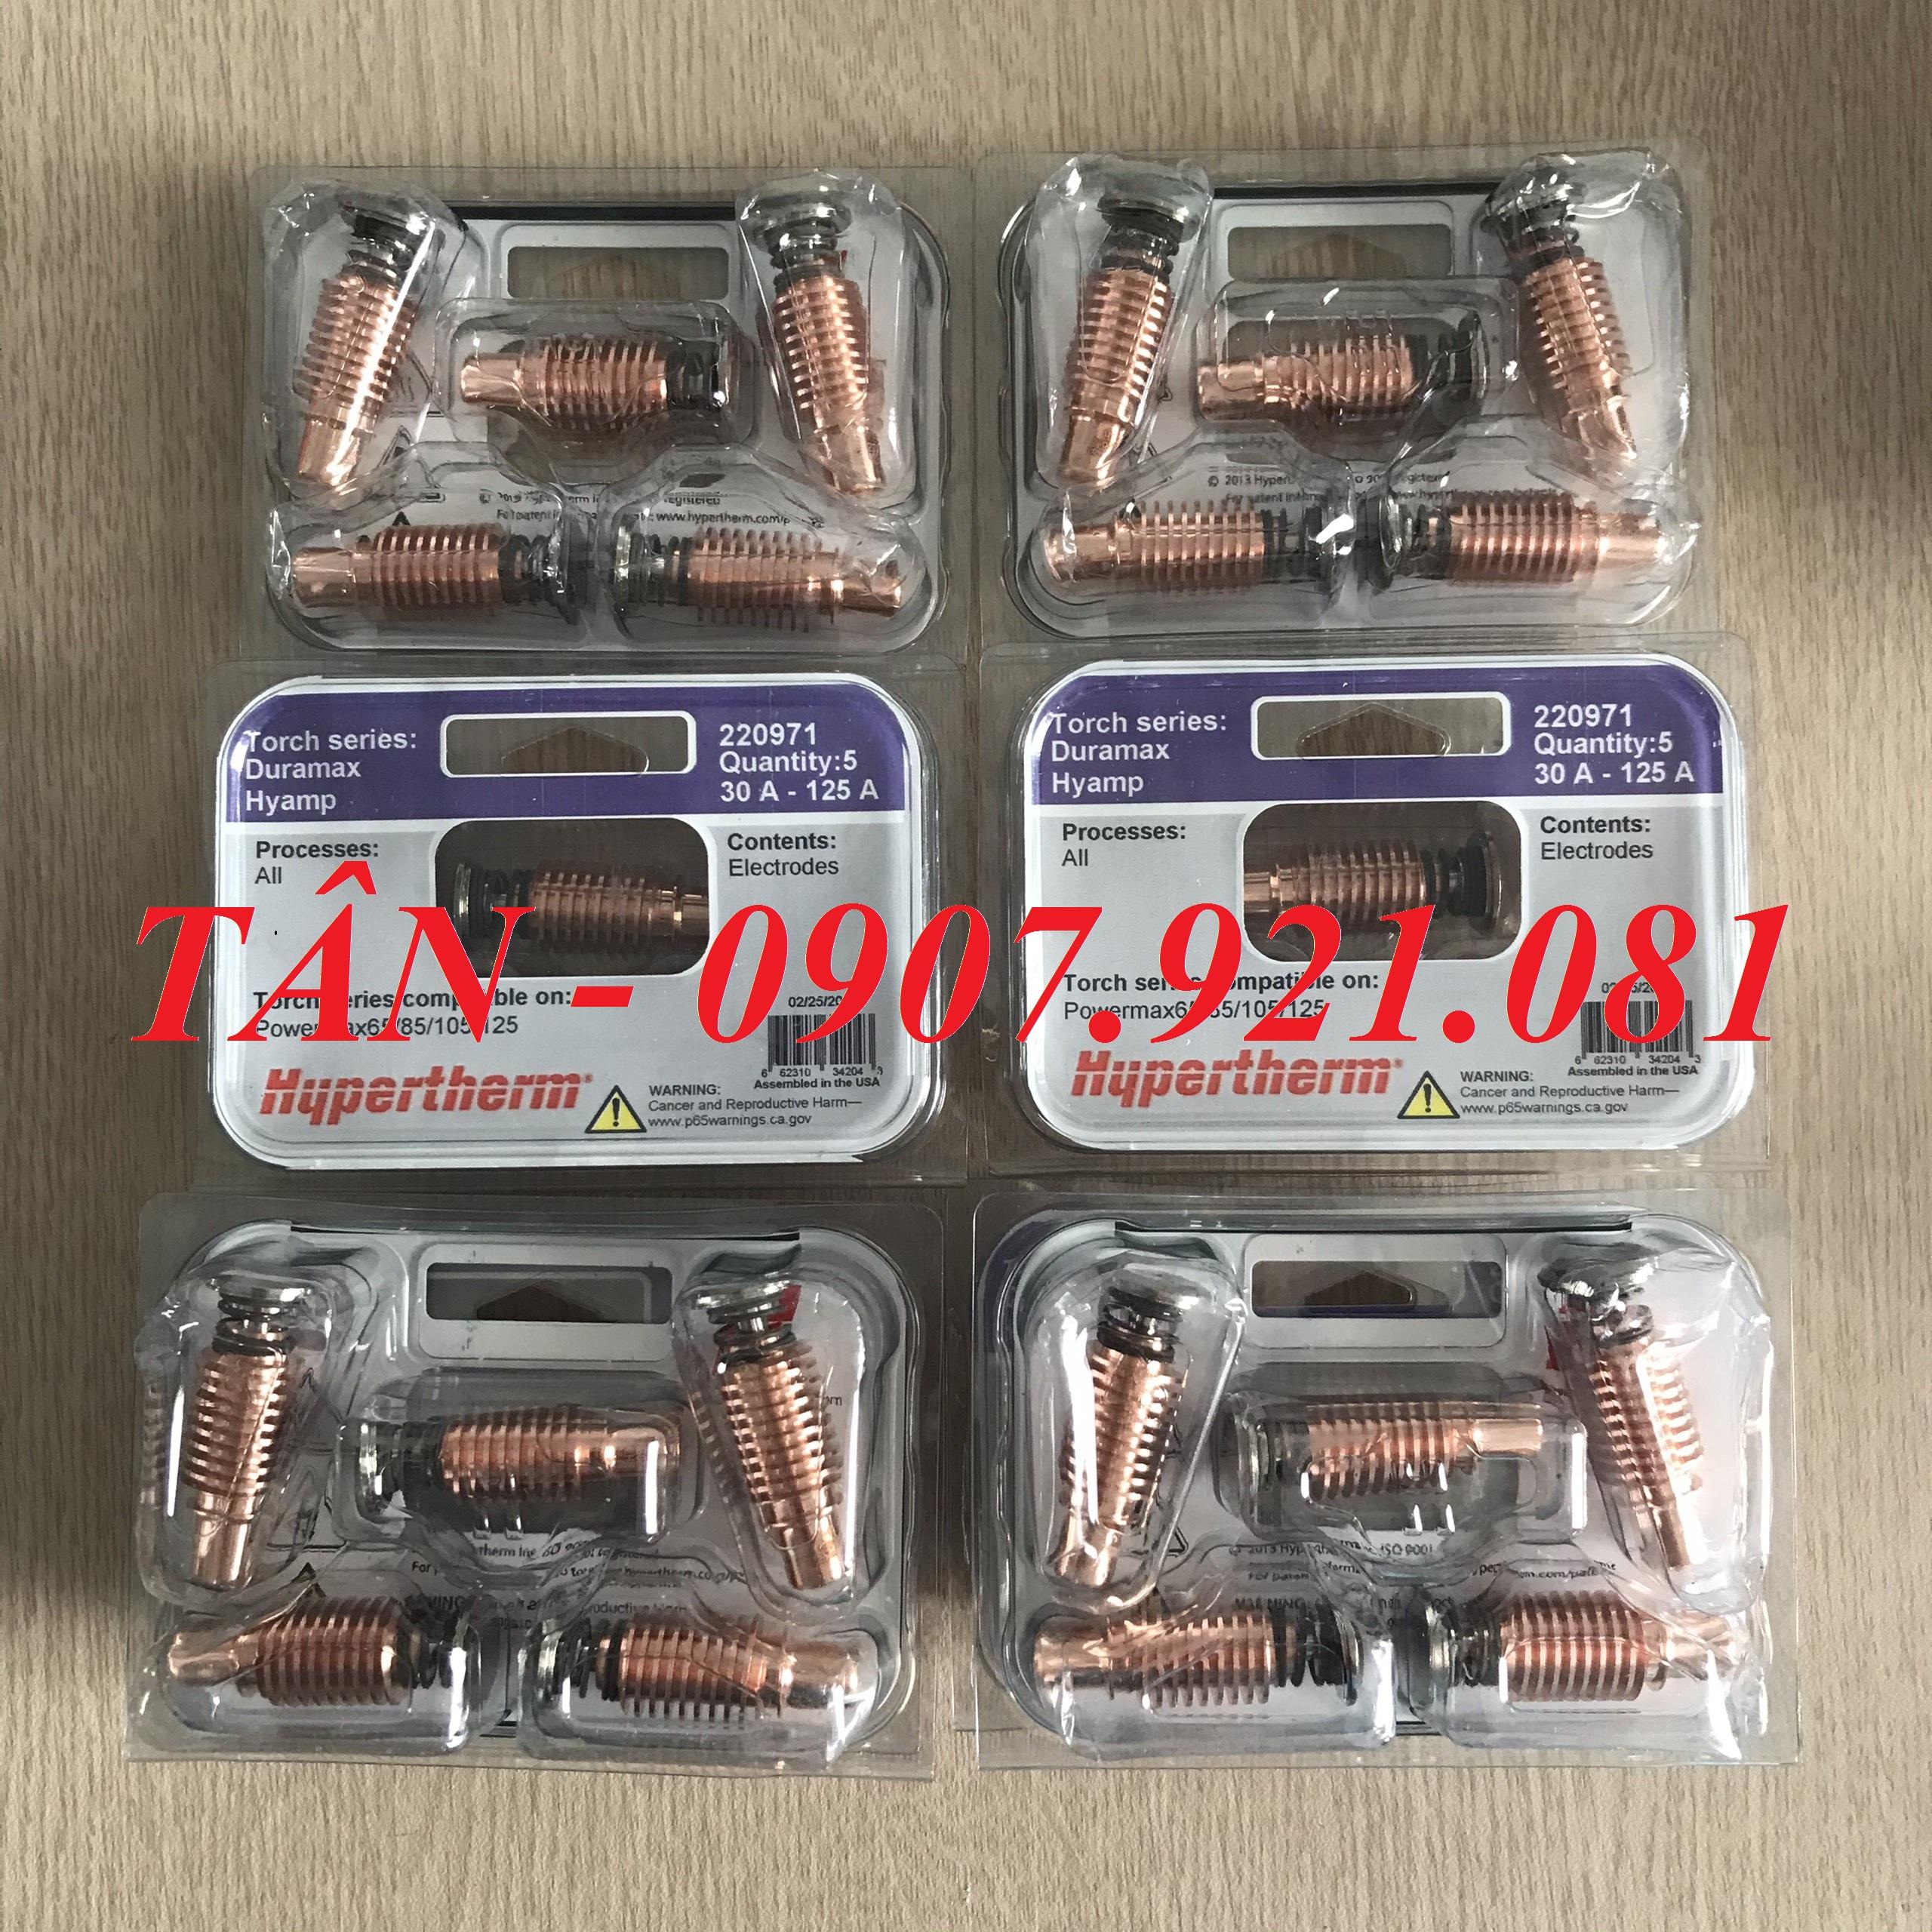 Điện cực plasma 220971 – Electrode plasma 220971 Hypertherm